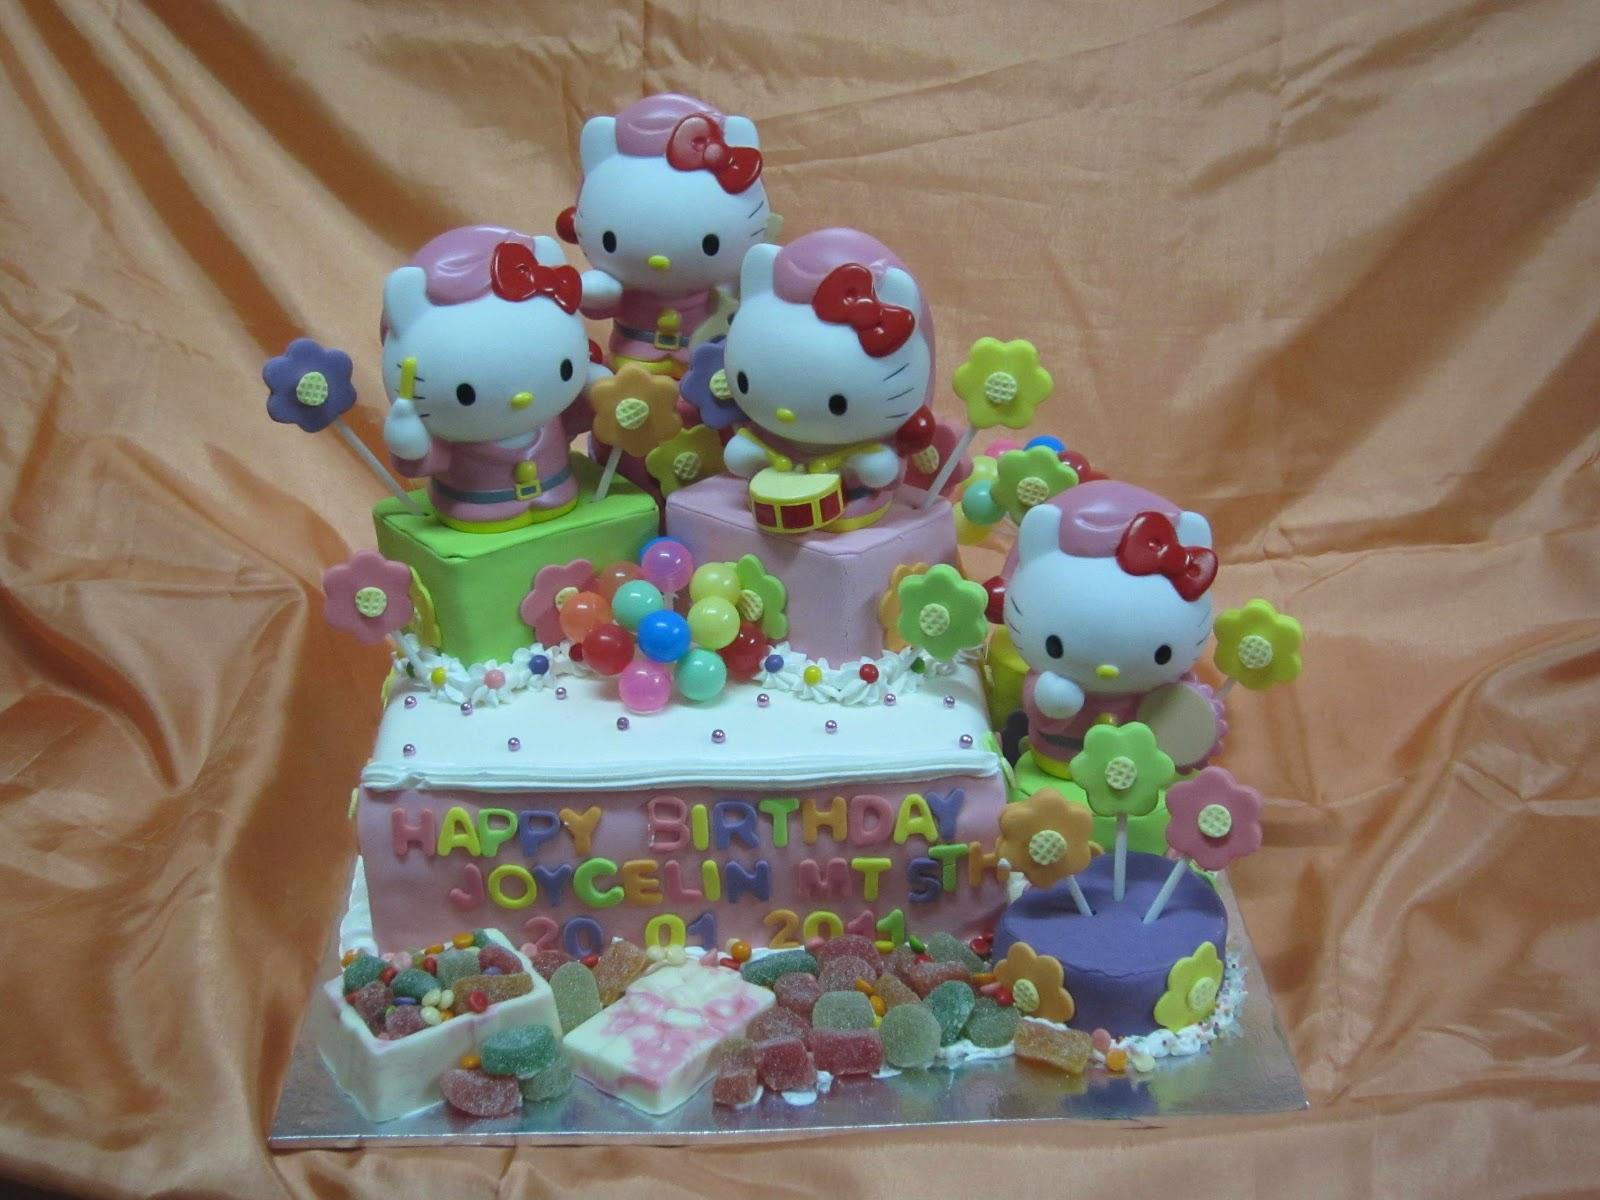 ... jpg posted in kue tart ulang tahun anak perempuan posted in kue tart